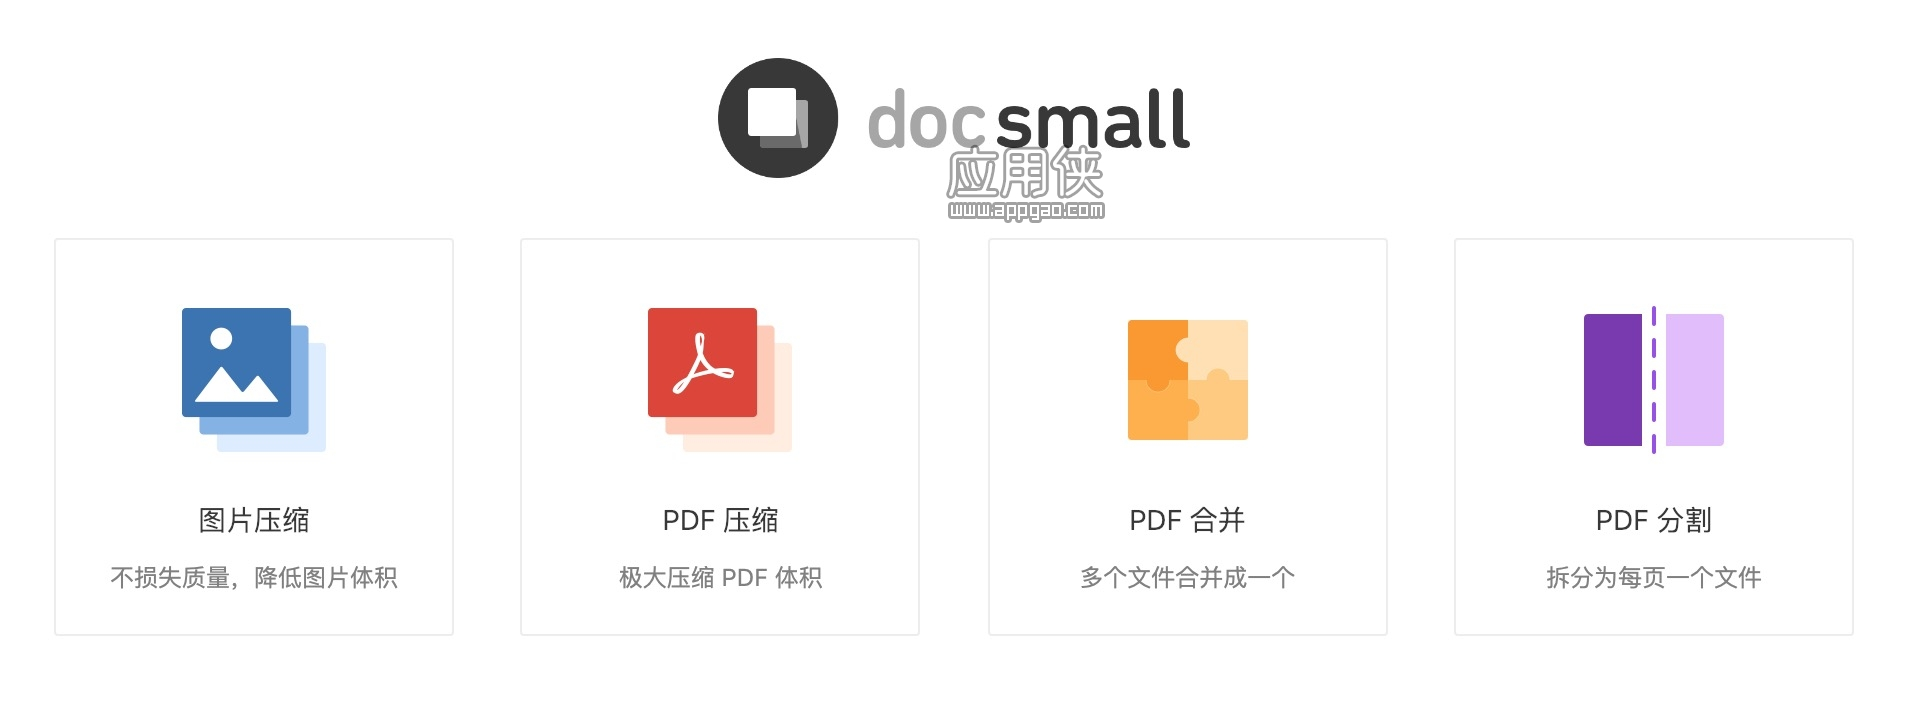 docsmall.jpg